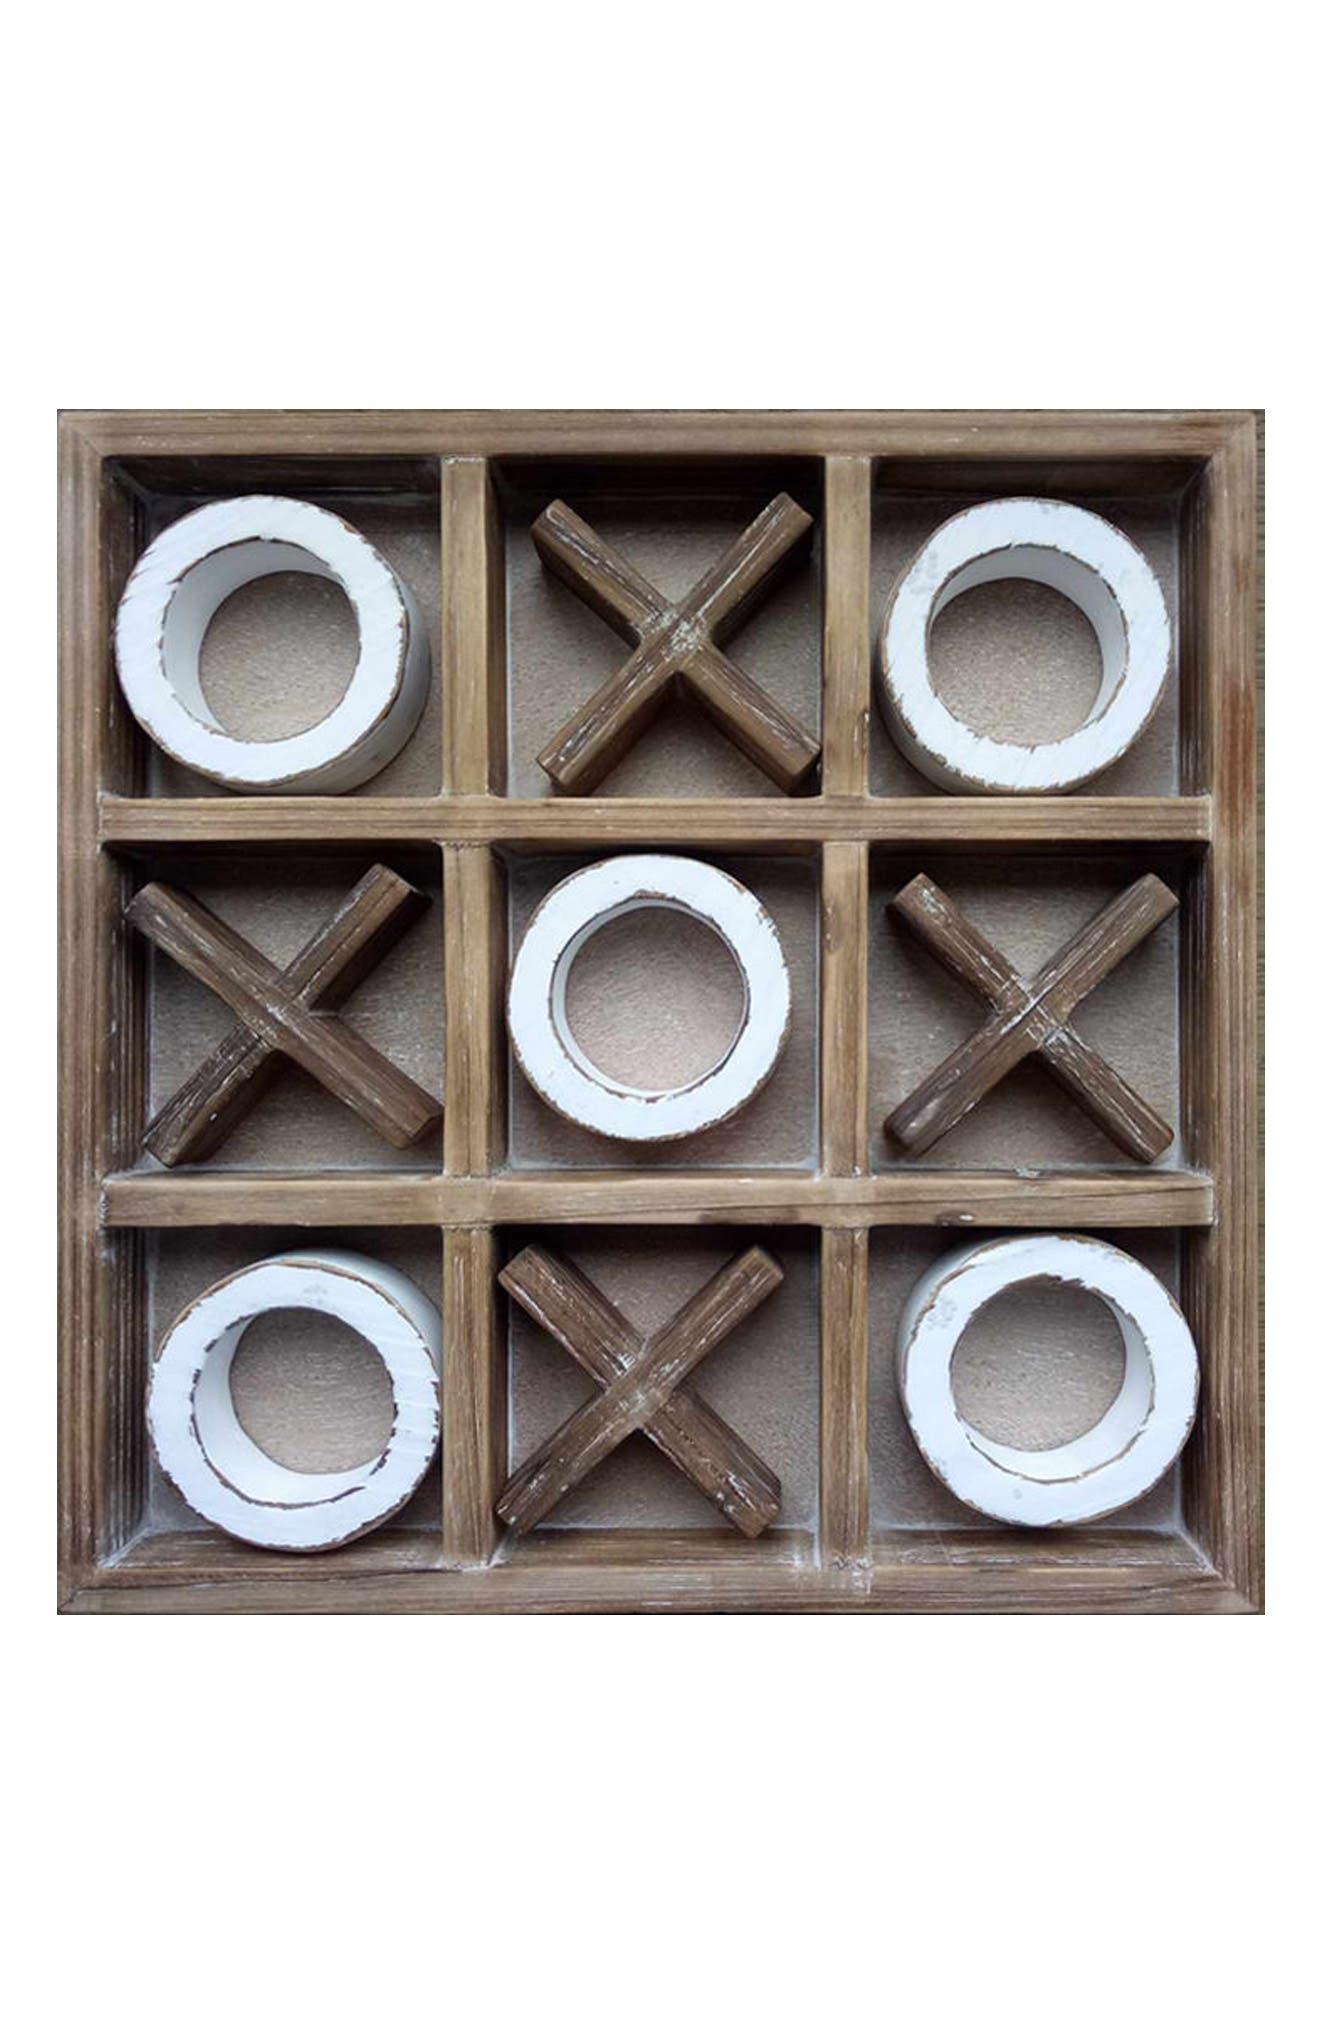 Main Image - Crystal Art Gallery Tic Tac Toe Wooden Wall Art